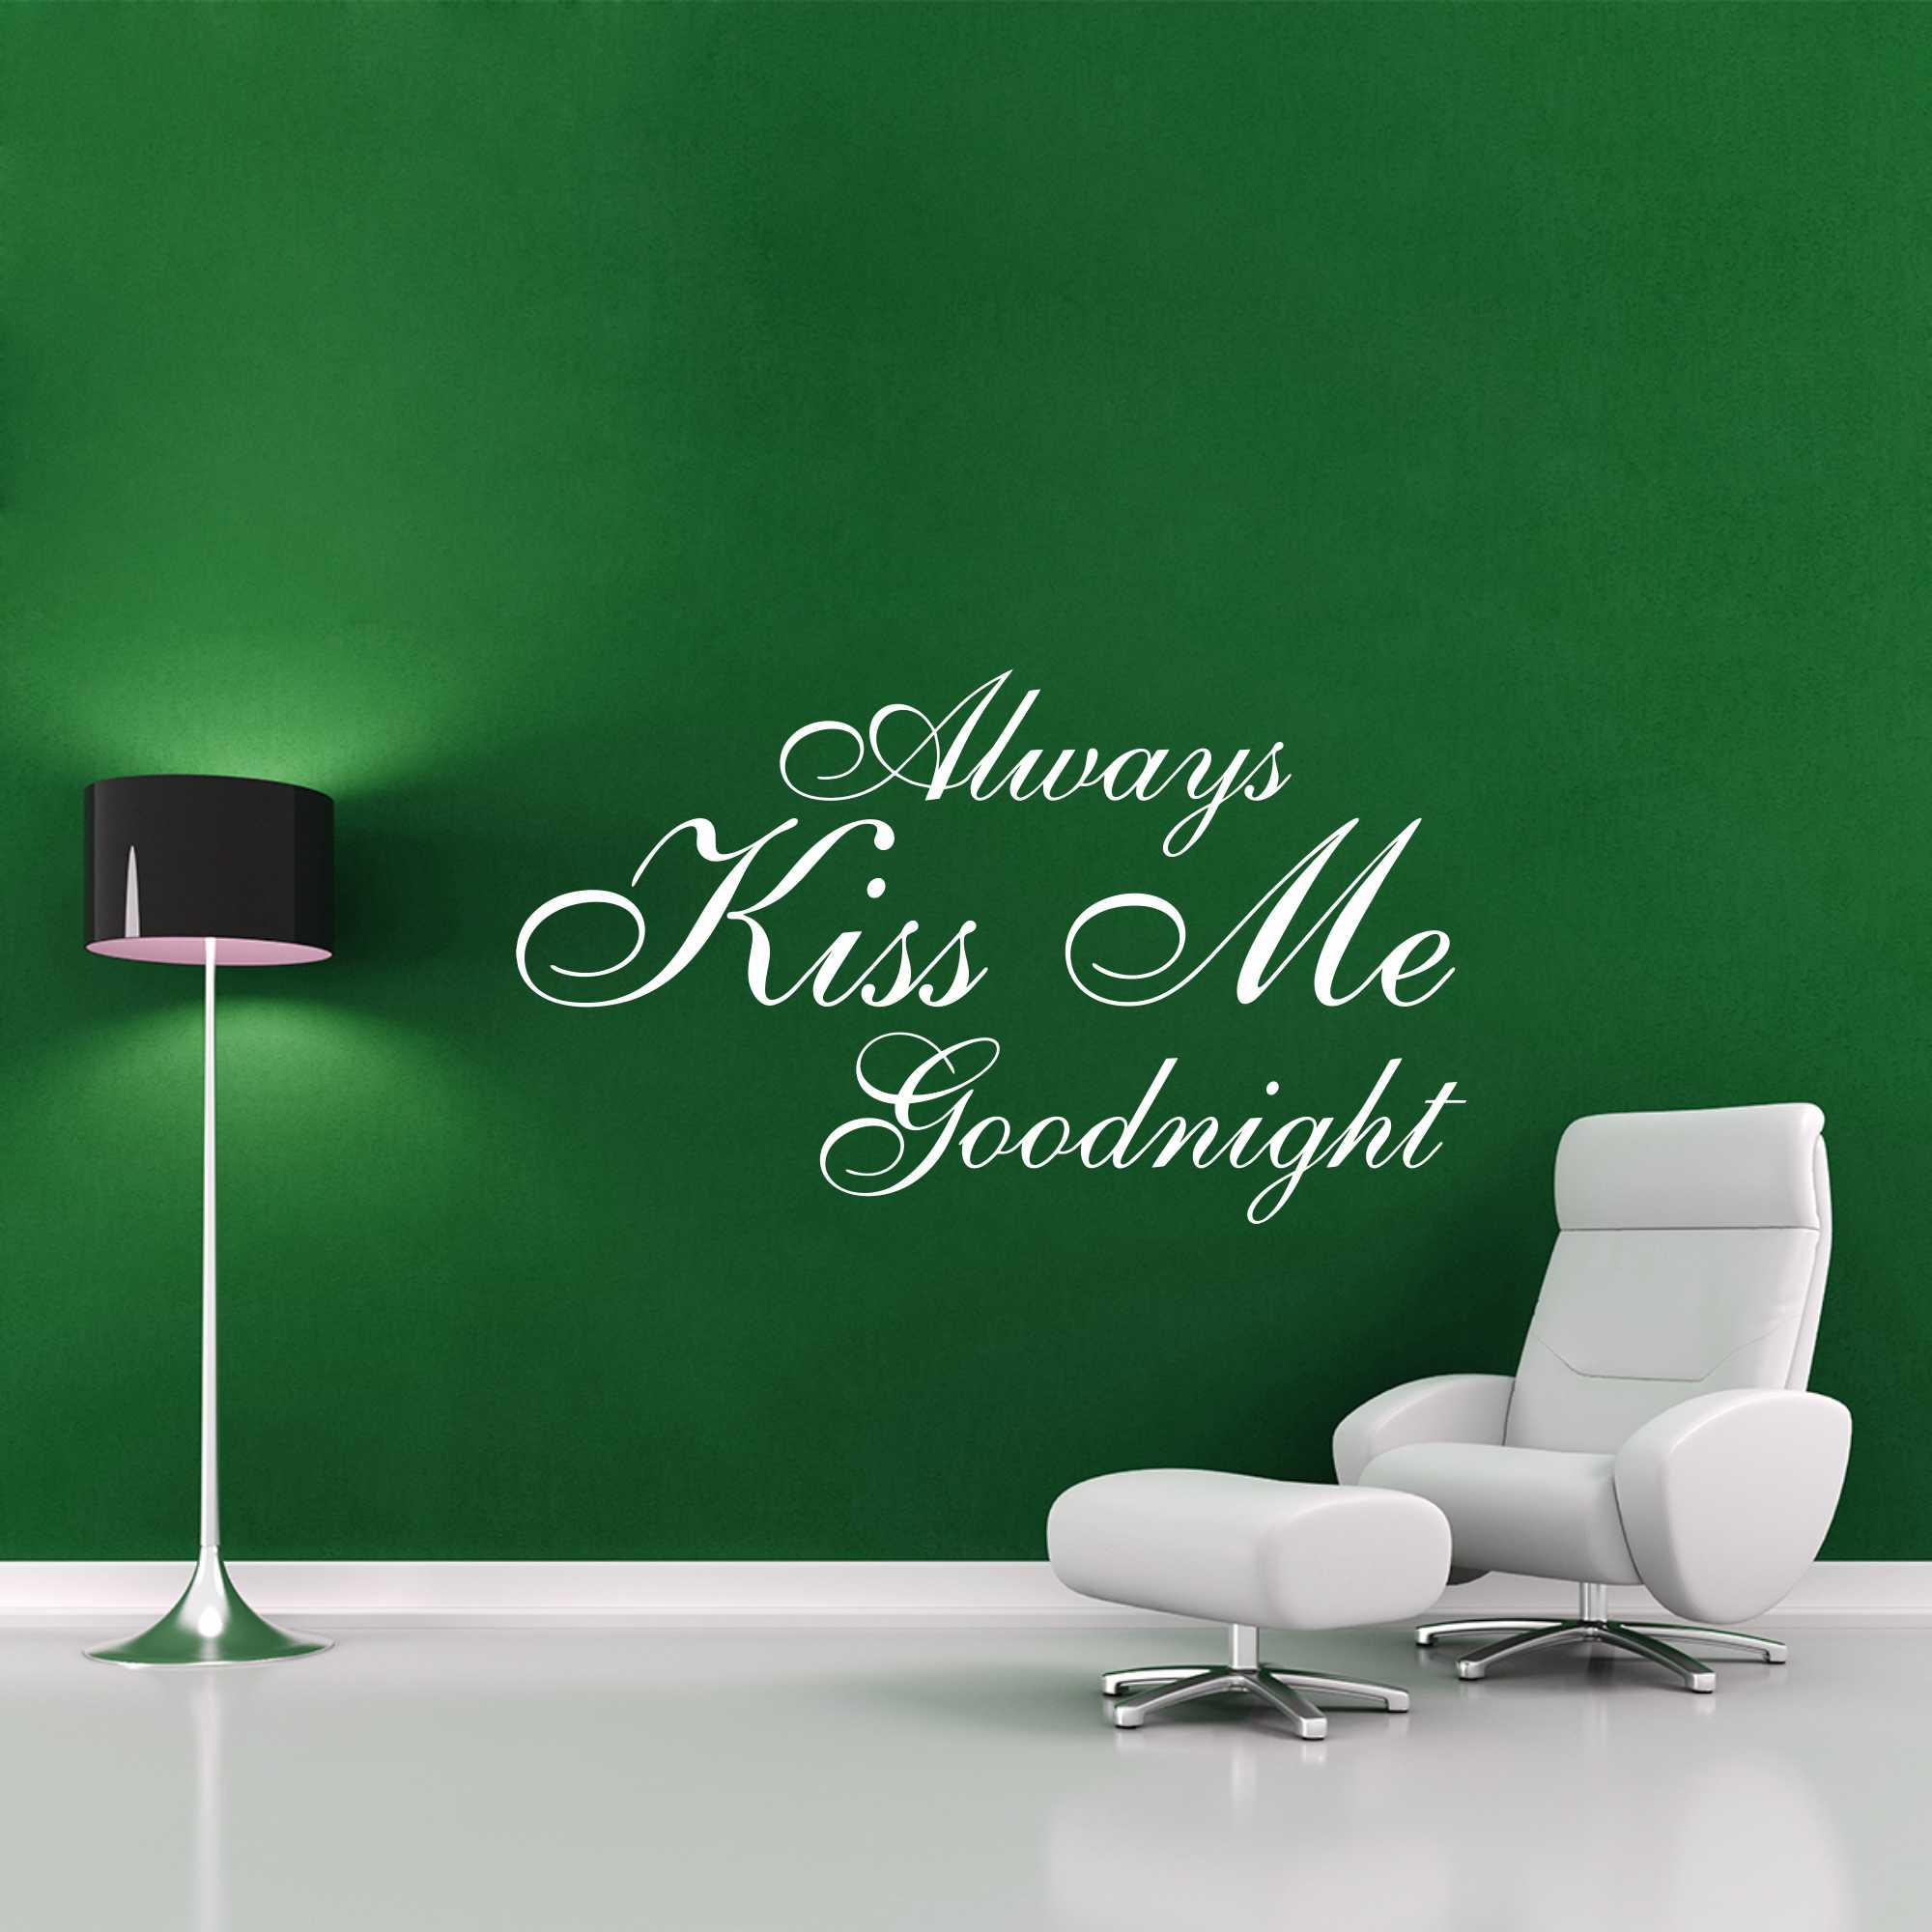 Samolepka na zeď - Kiss me nápis - 60x35 cm - PopyDesign